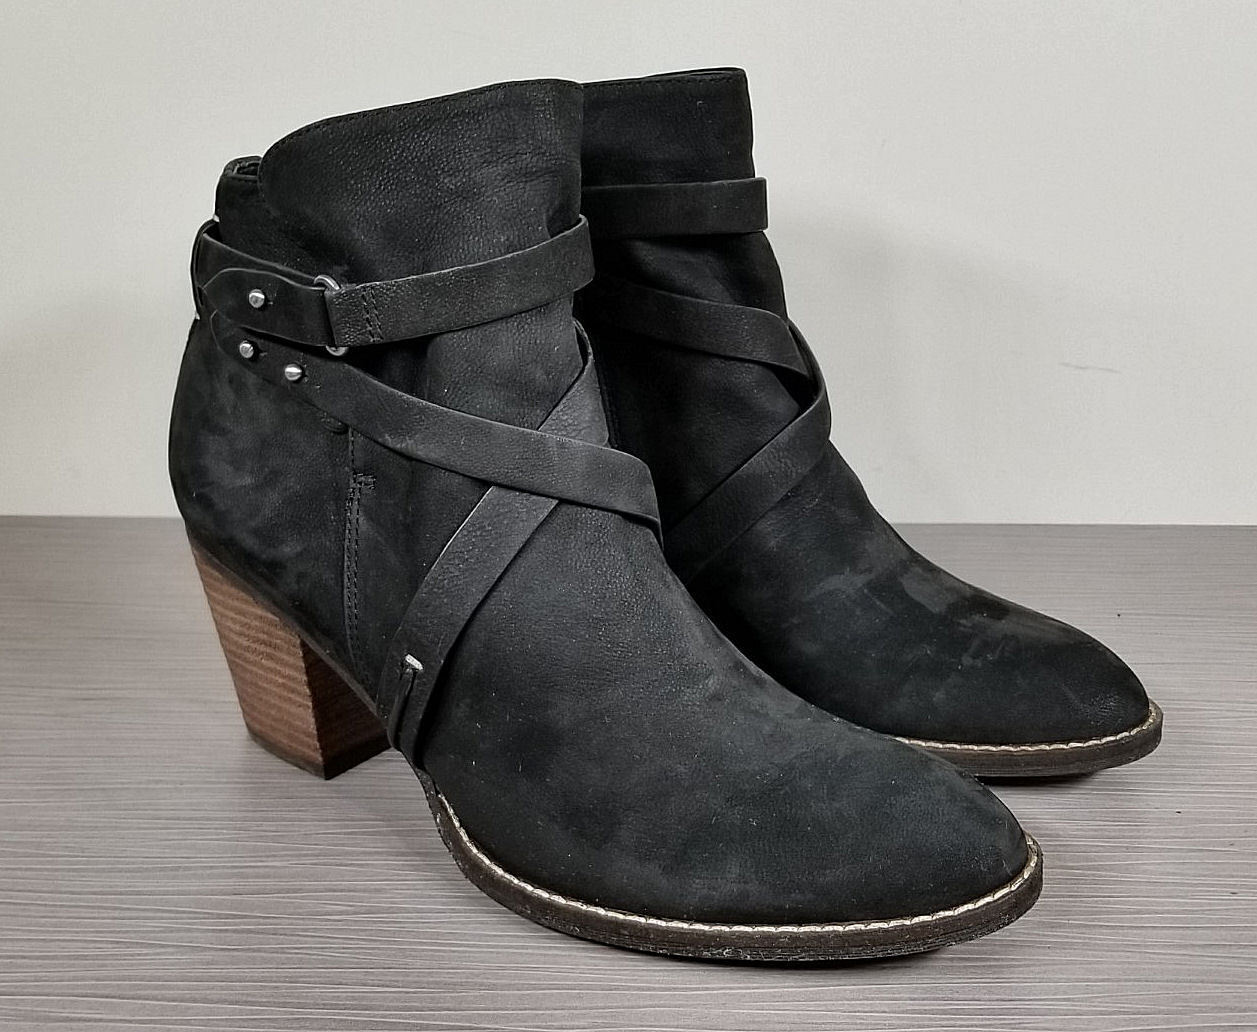 Sam Sam Sam Edelman Merton Bootie, Black Leather, Womens Size 9.5 M 5aede6